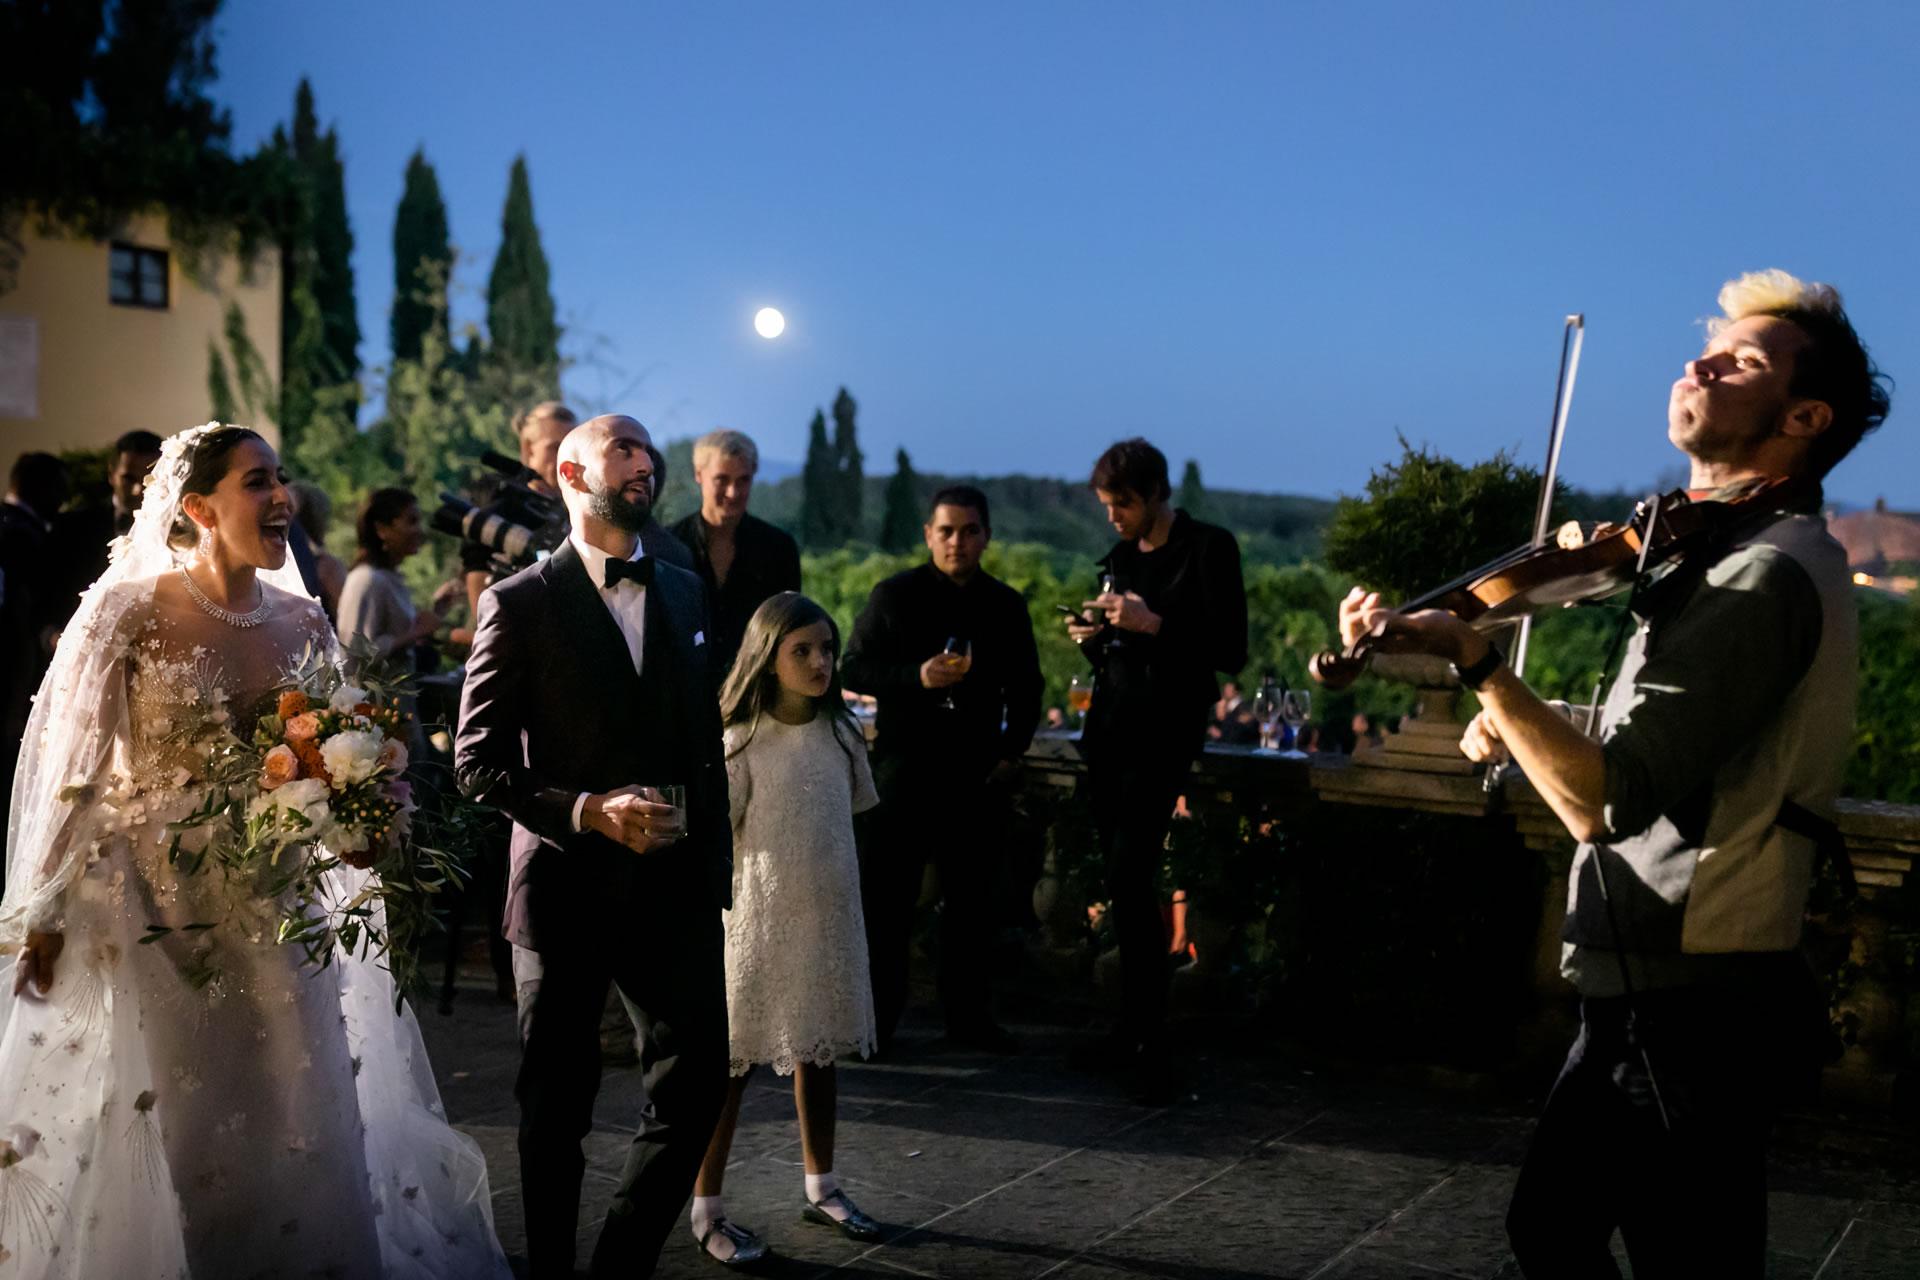 Violin - 41 :: Luxury wedding at Il Borro :: Luxury wedding photography - 40 :: Violin - 41